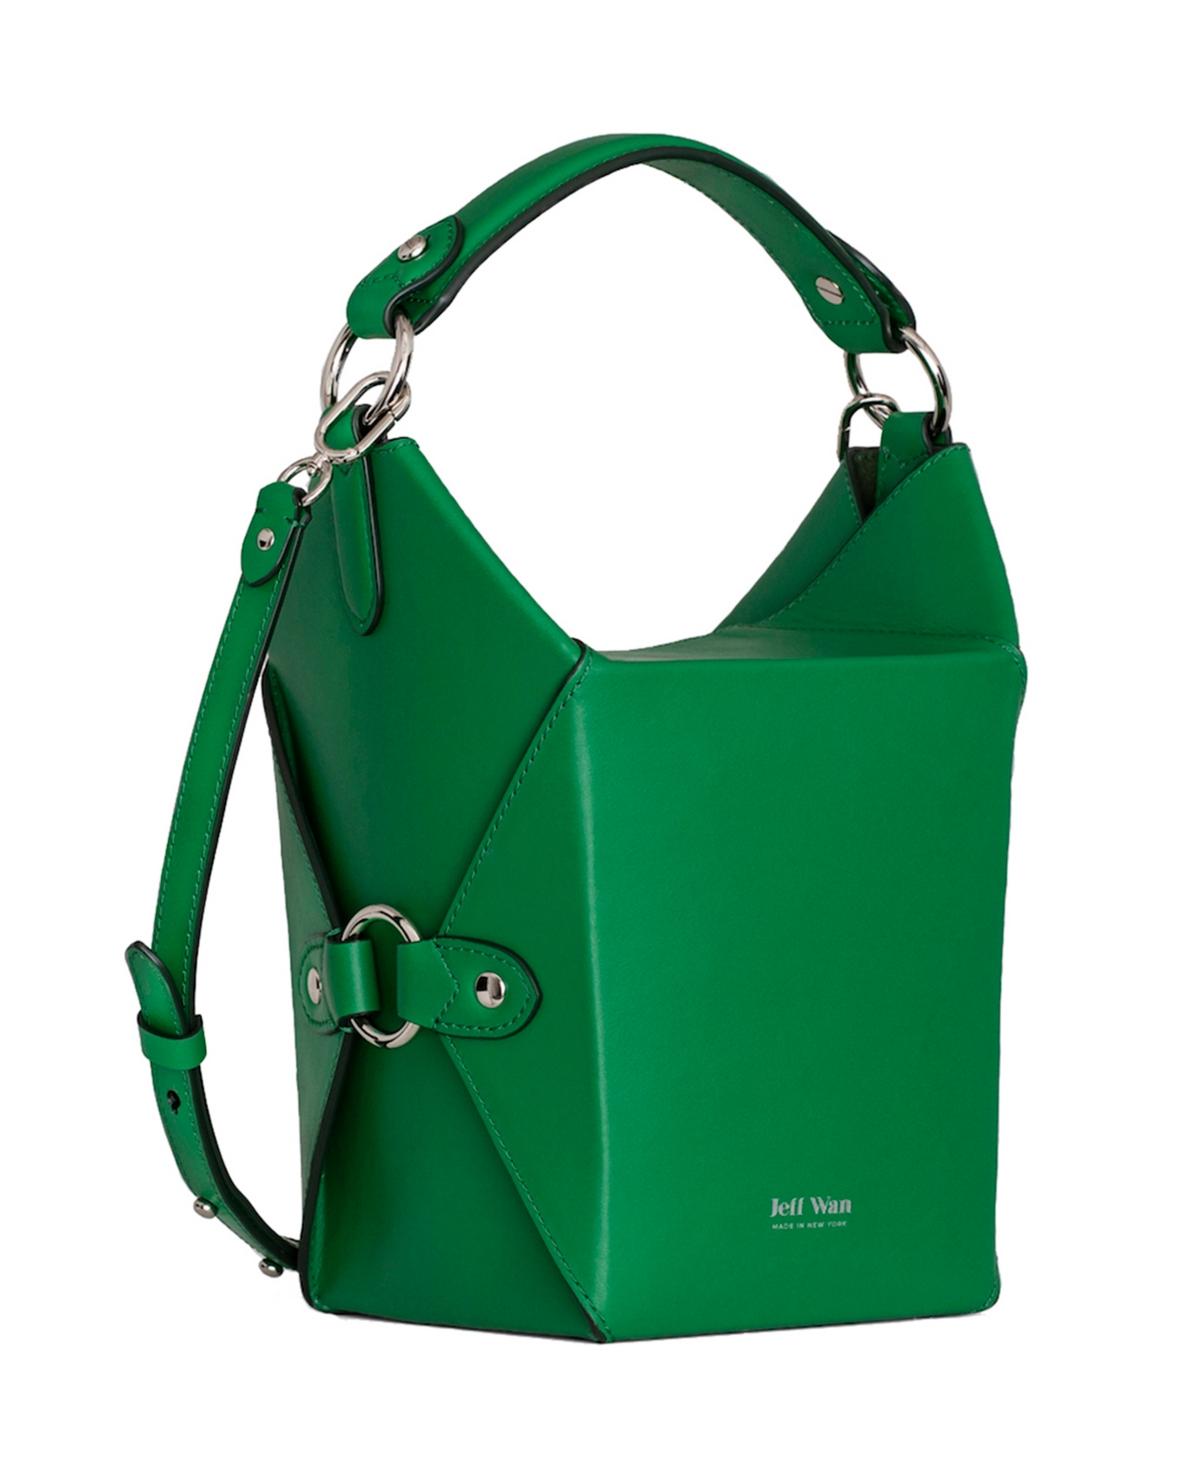 Jeff Wan Le Morne Lunch Box Bucket Bag